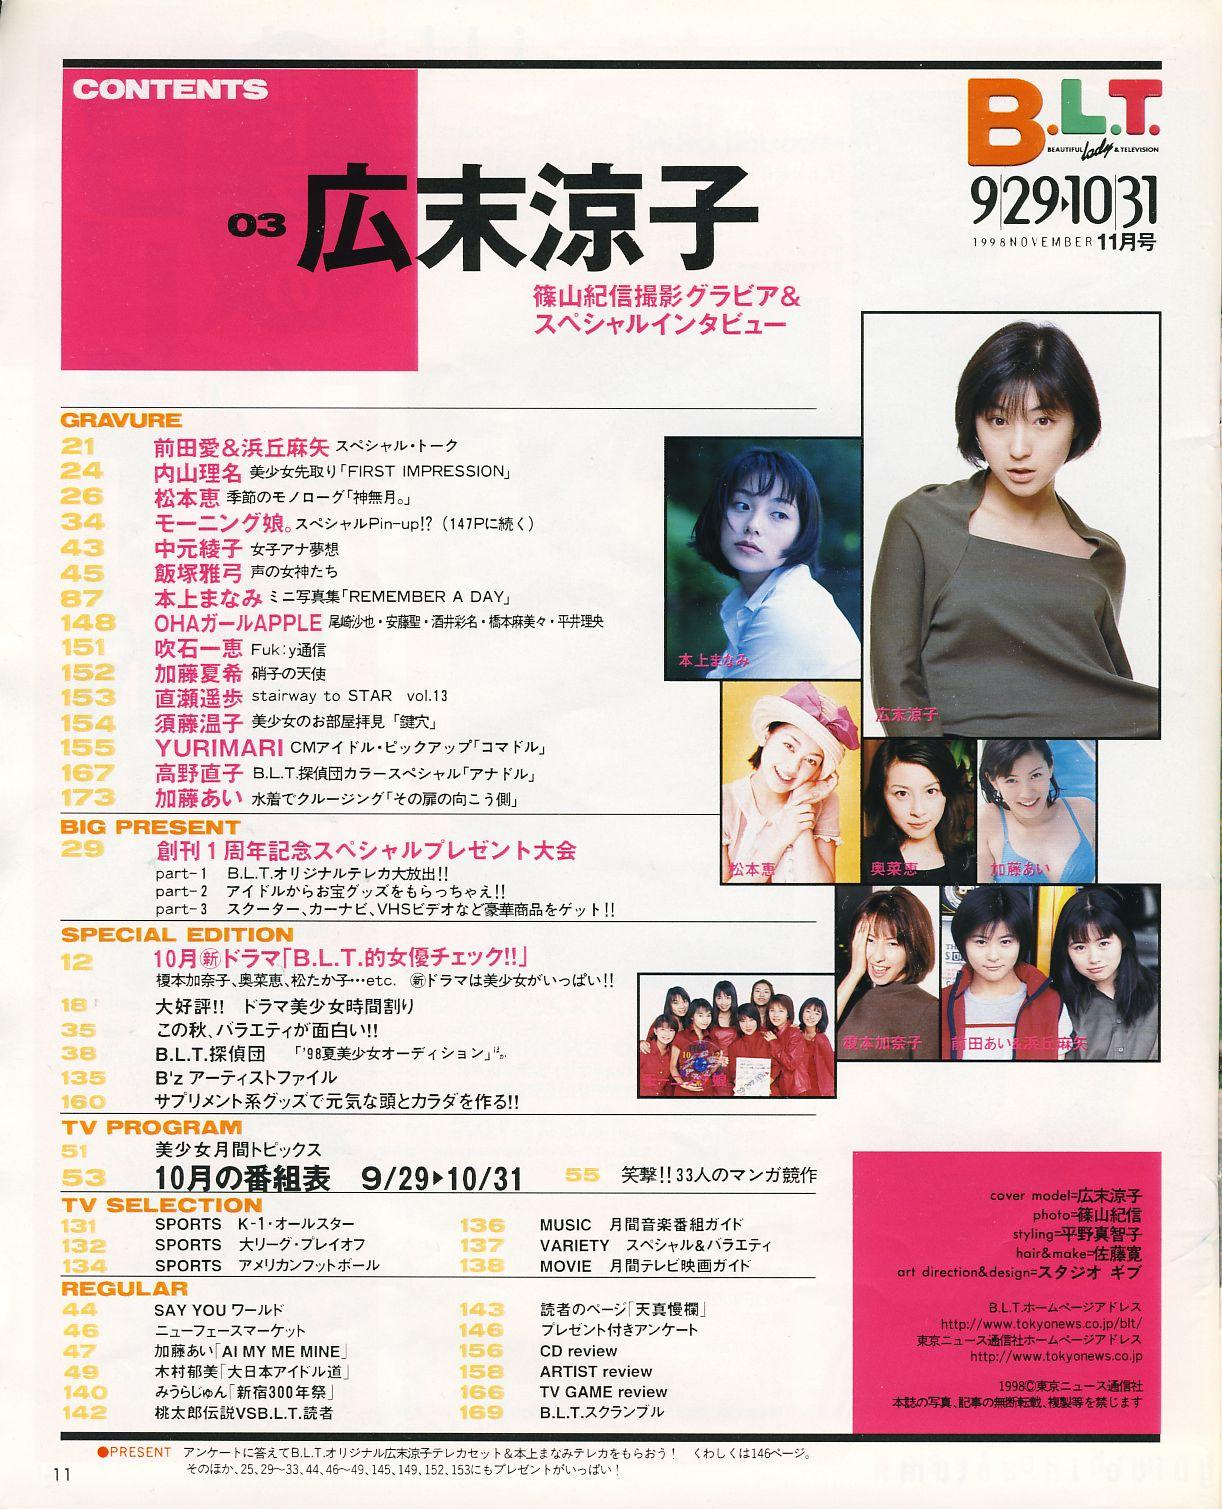 Календарь за 1998-1999